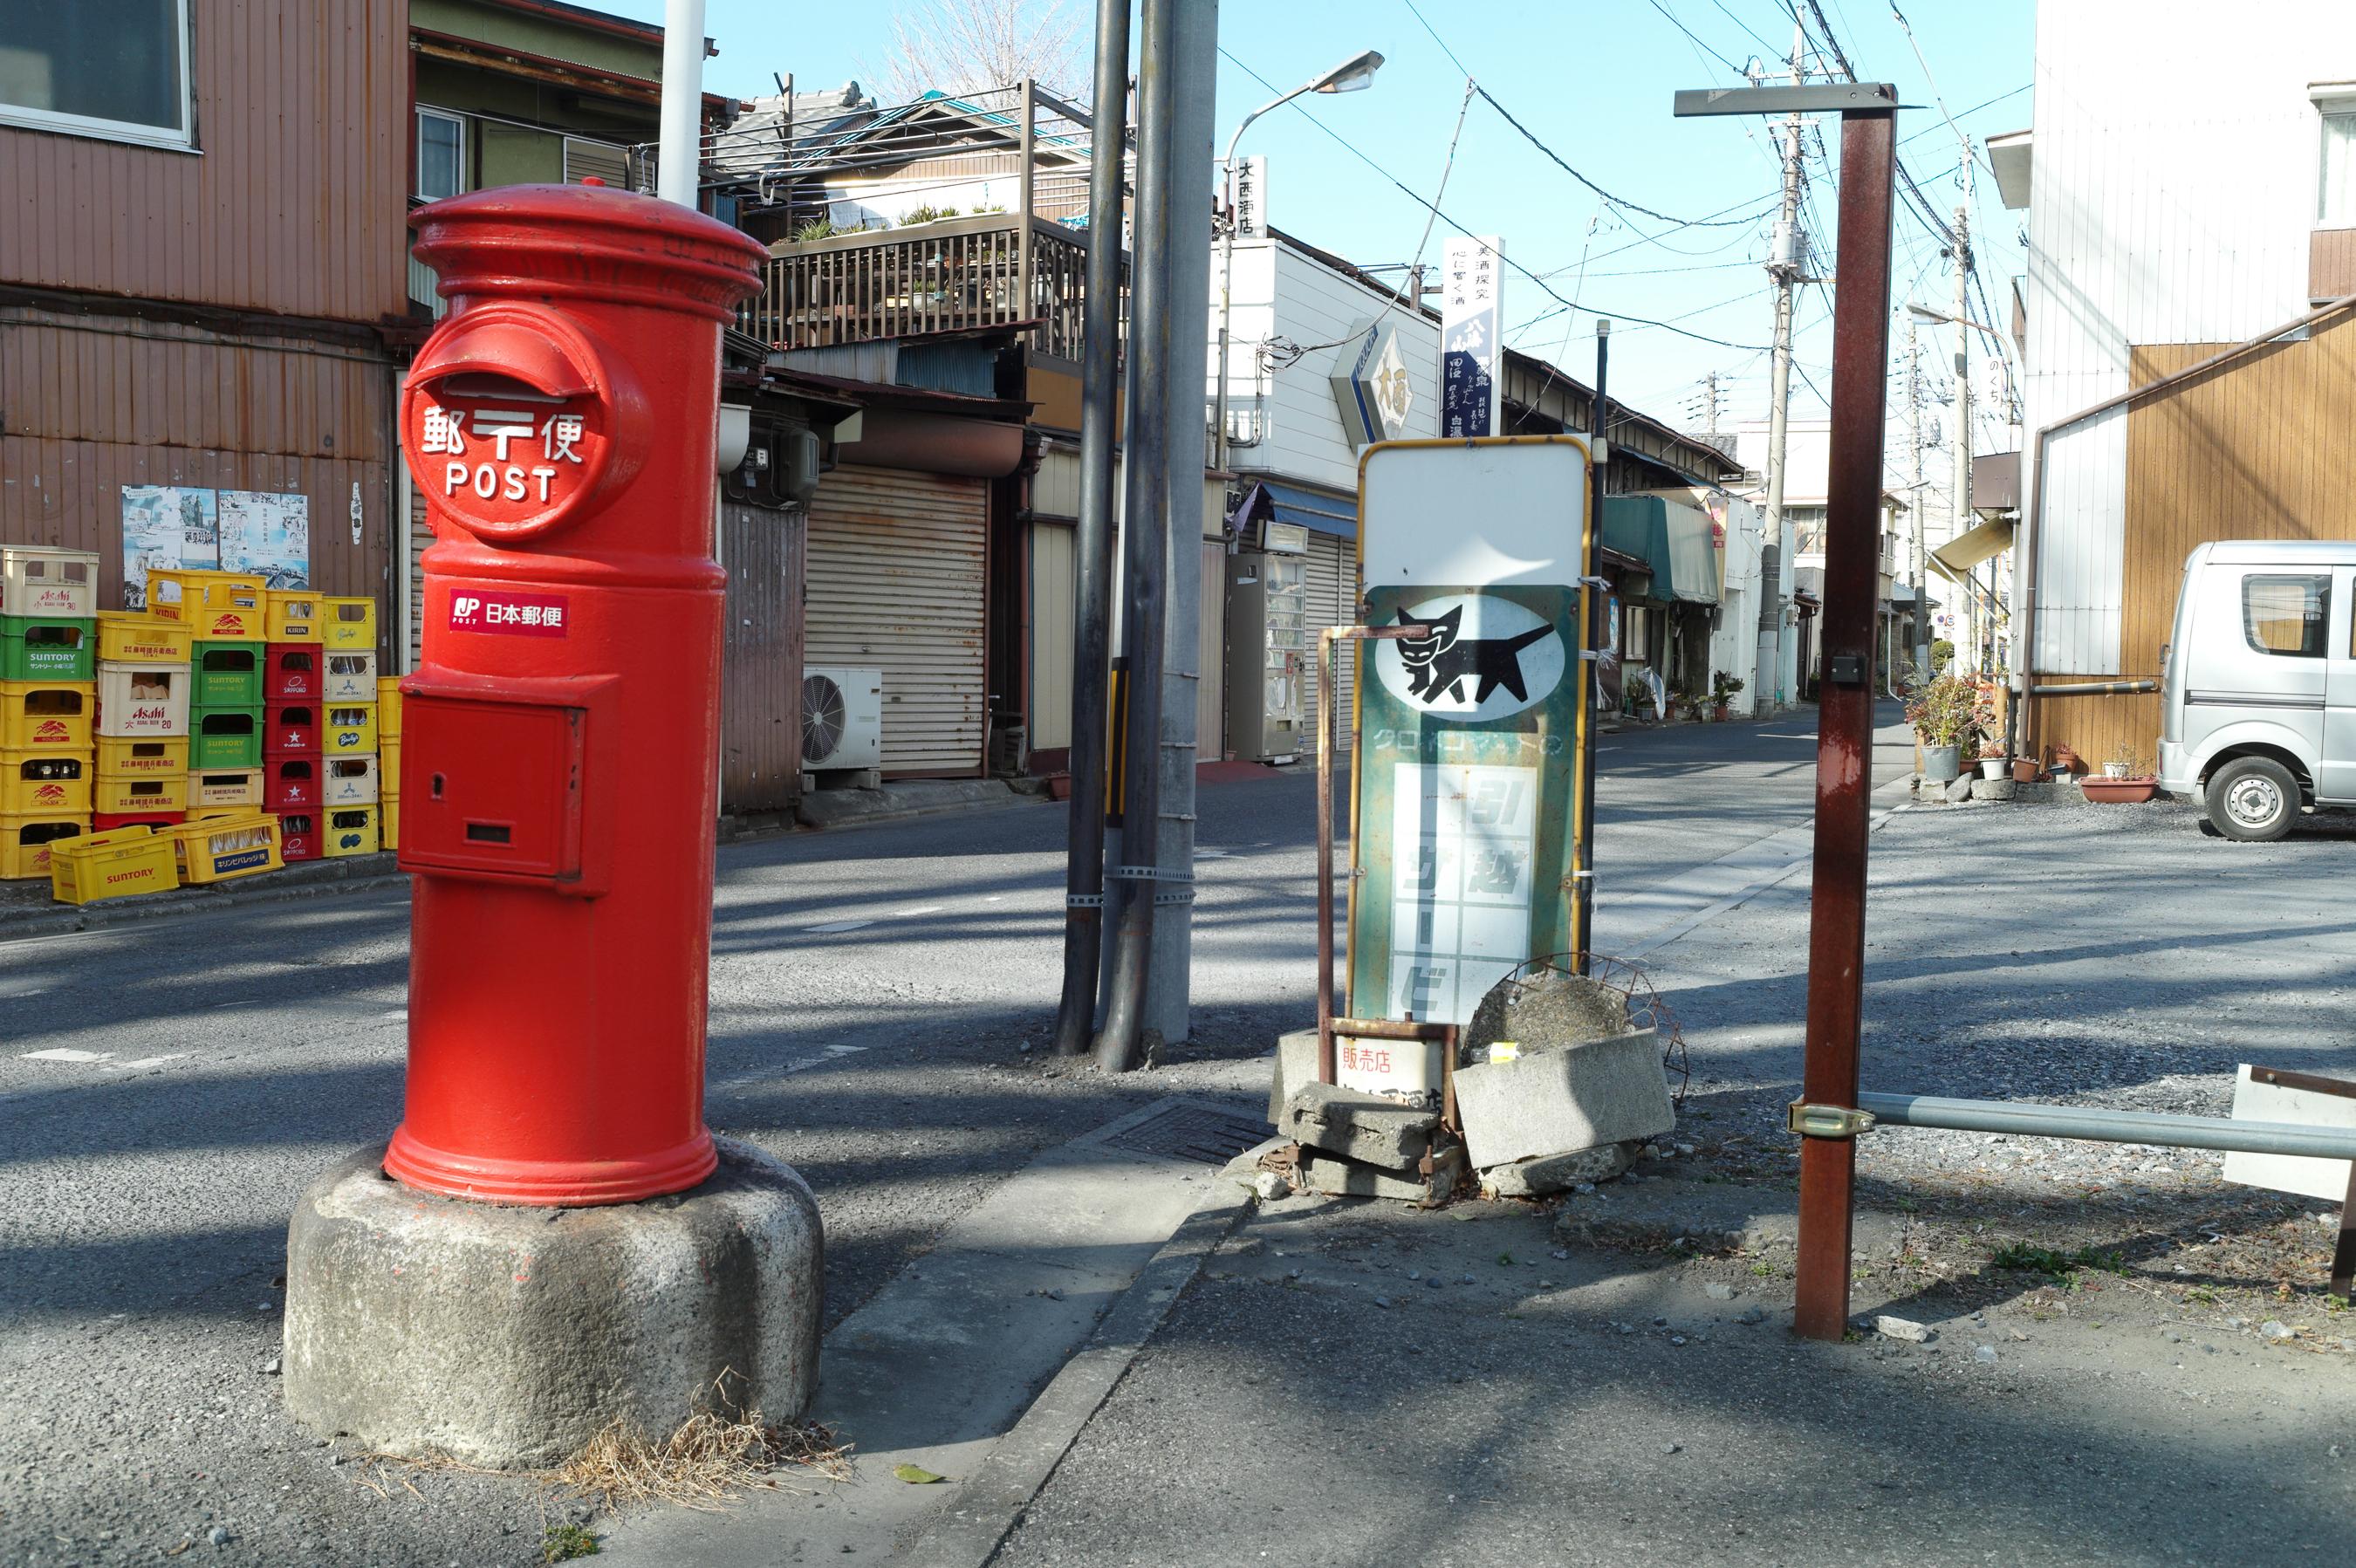 f:id:aoyama-takuro:20180211213016j:plain